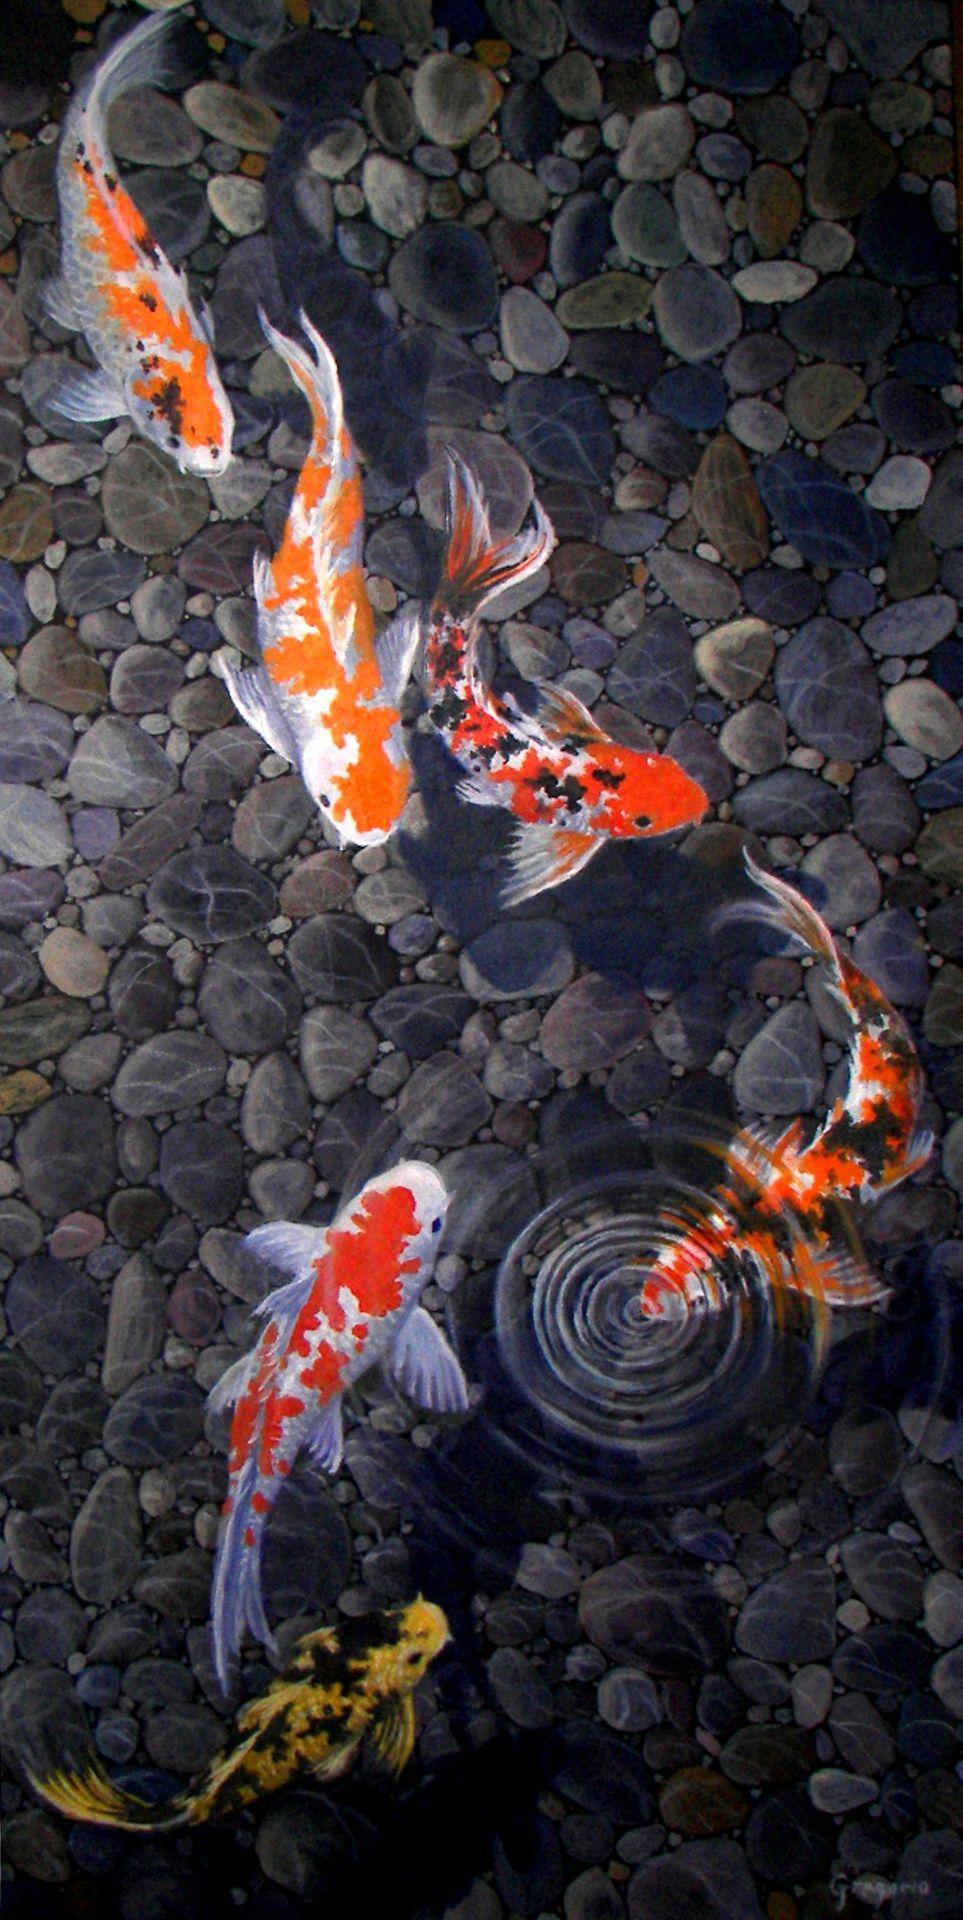 Koi Pond Poisson Rouge Art De Poissons Et Carpe Koi